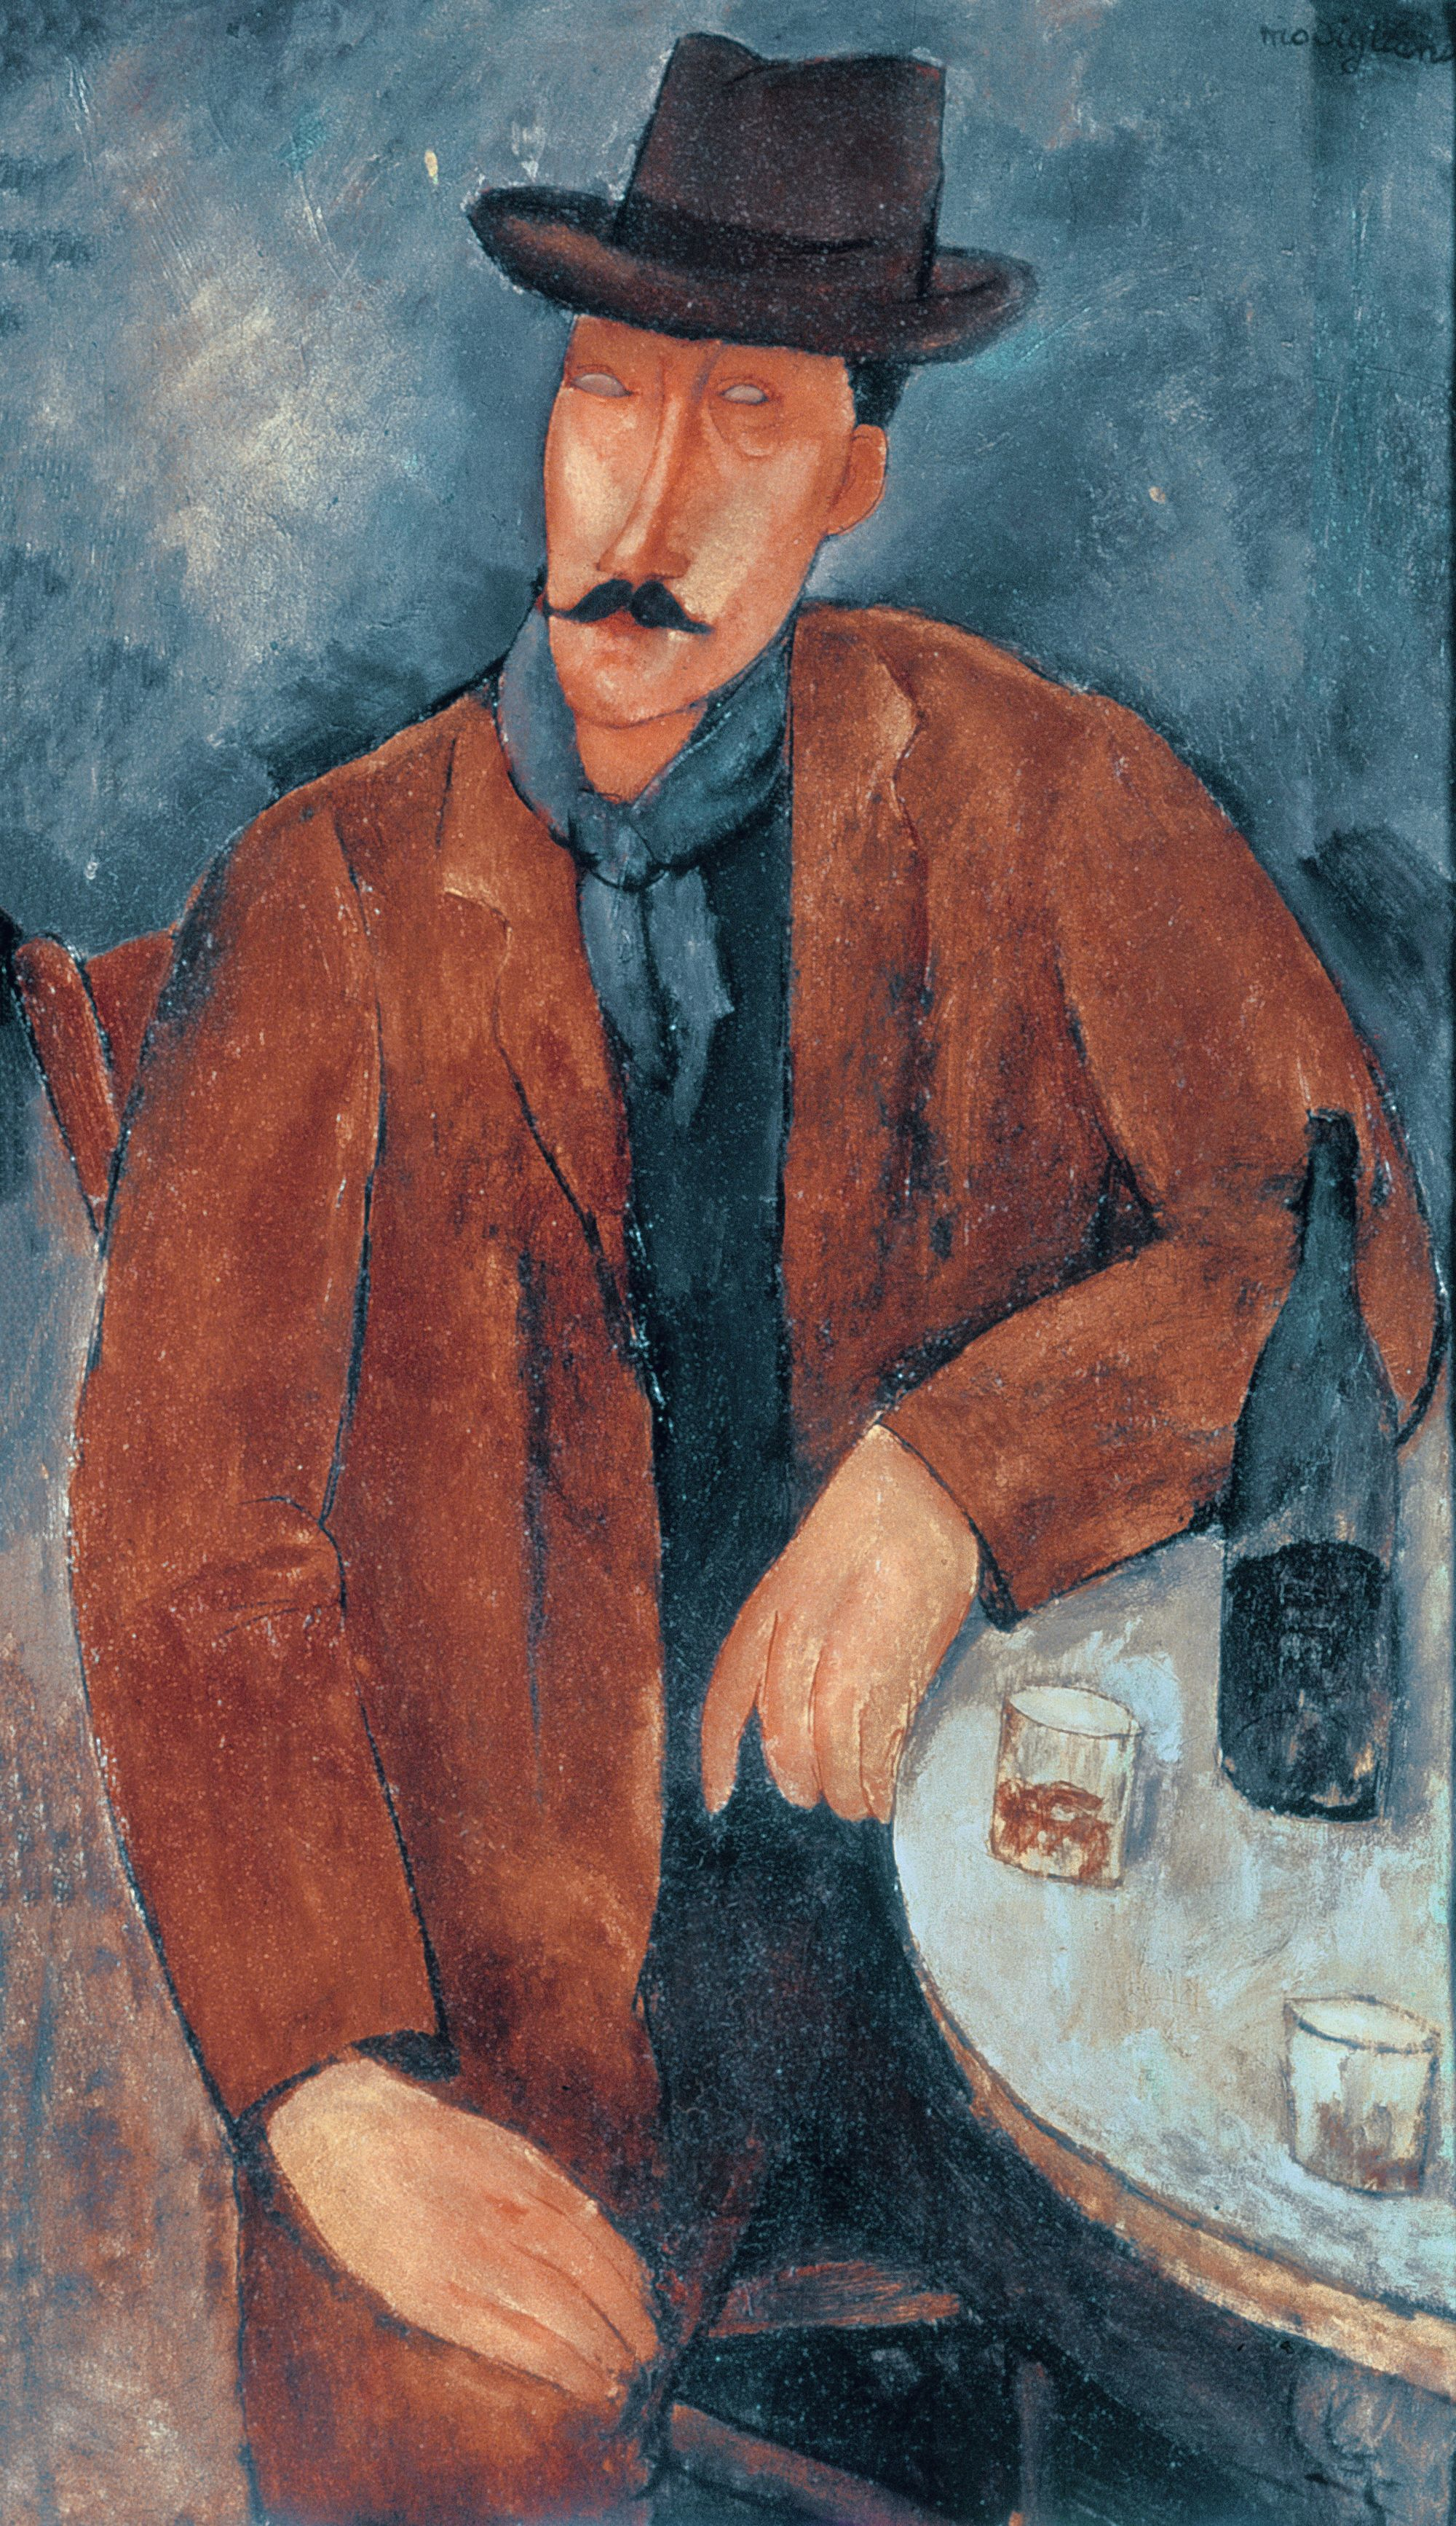 Amedeo Modigliani Homme avec un verre de vin